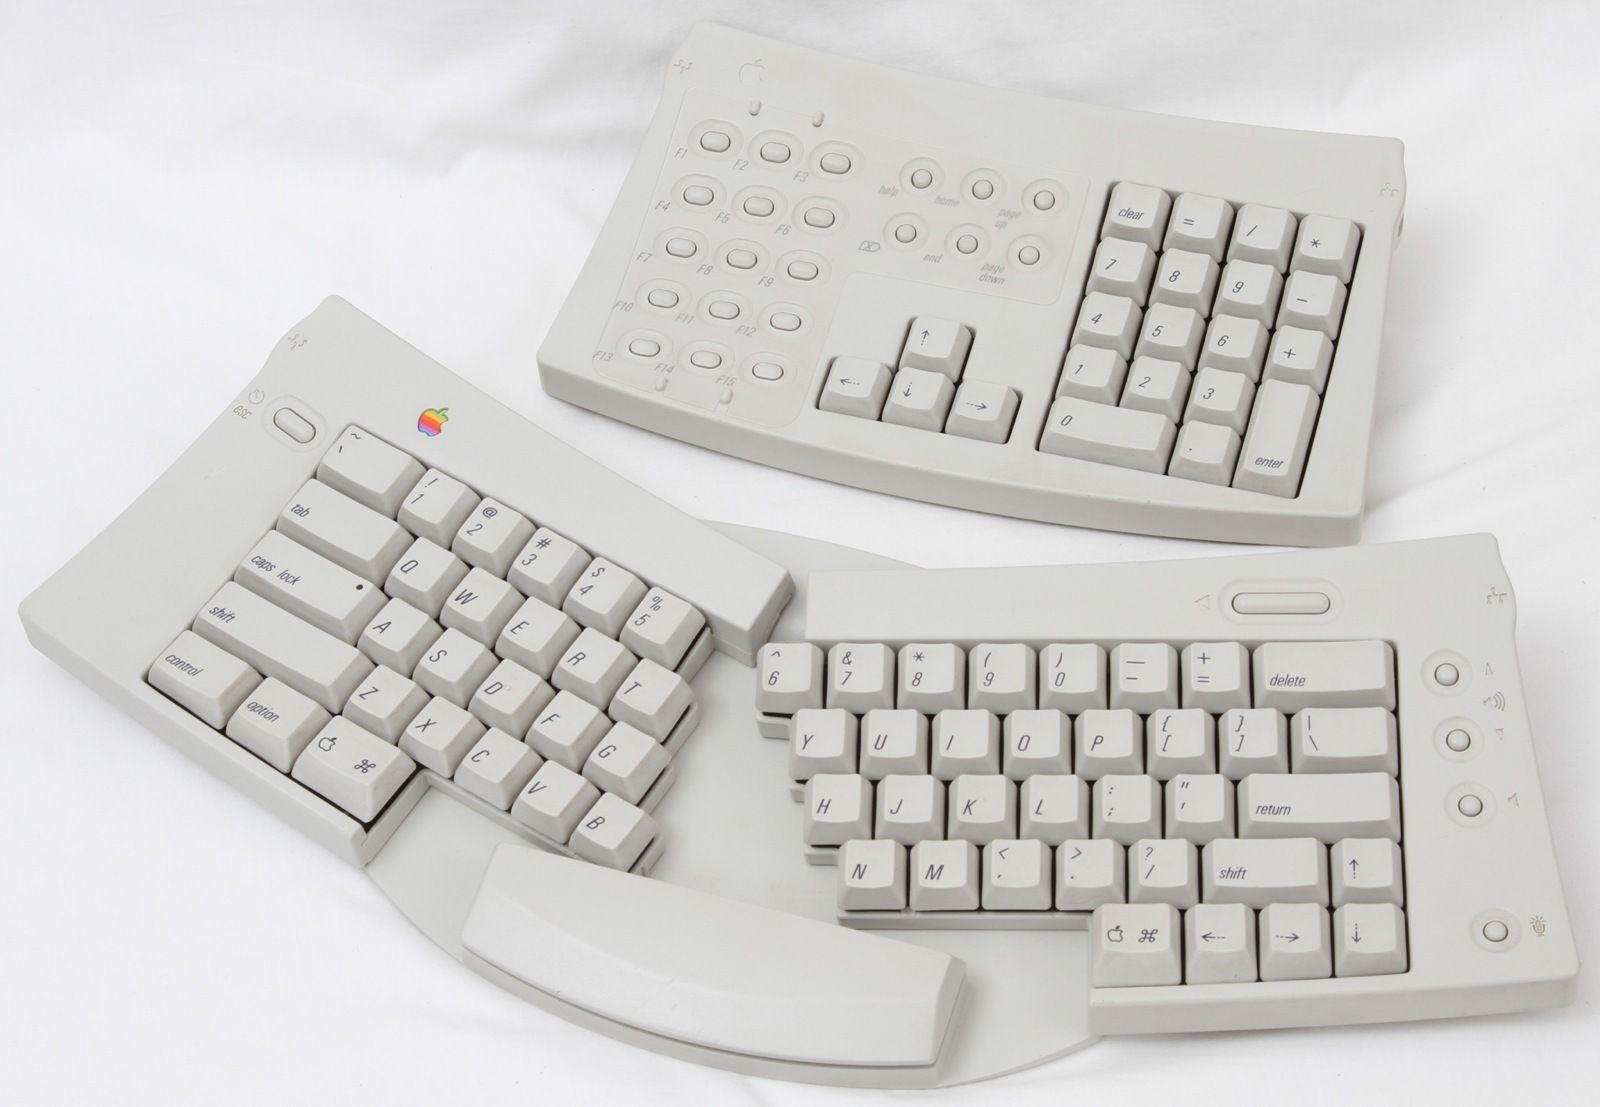 Rare Vintage Apple Adjustable Keyboard With Numeric Keypad Numeric Keypads Keyboard Vintage Apple